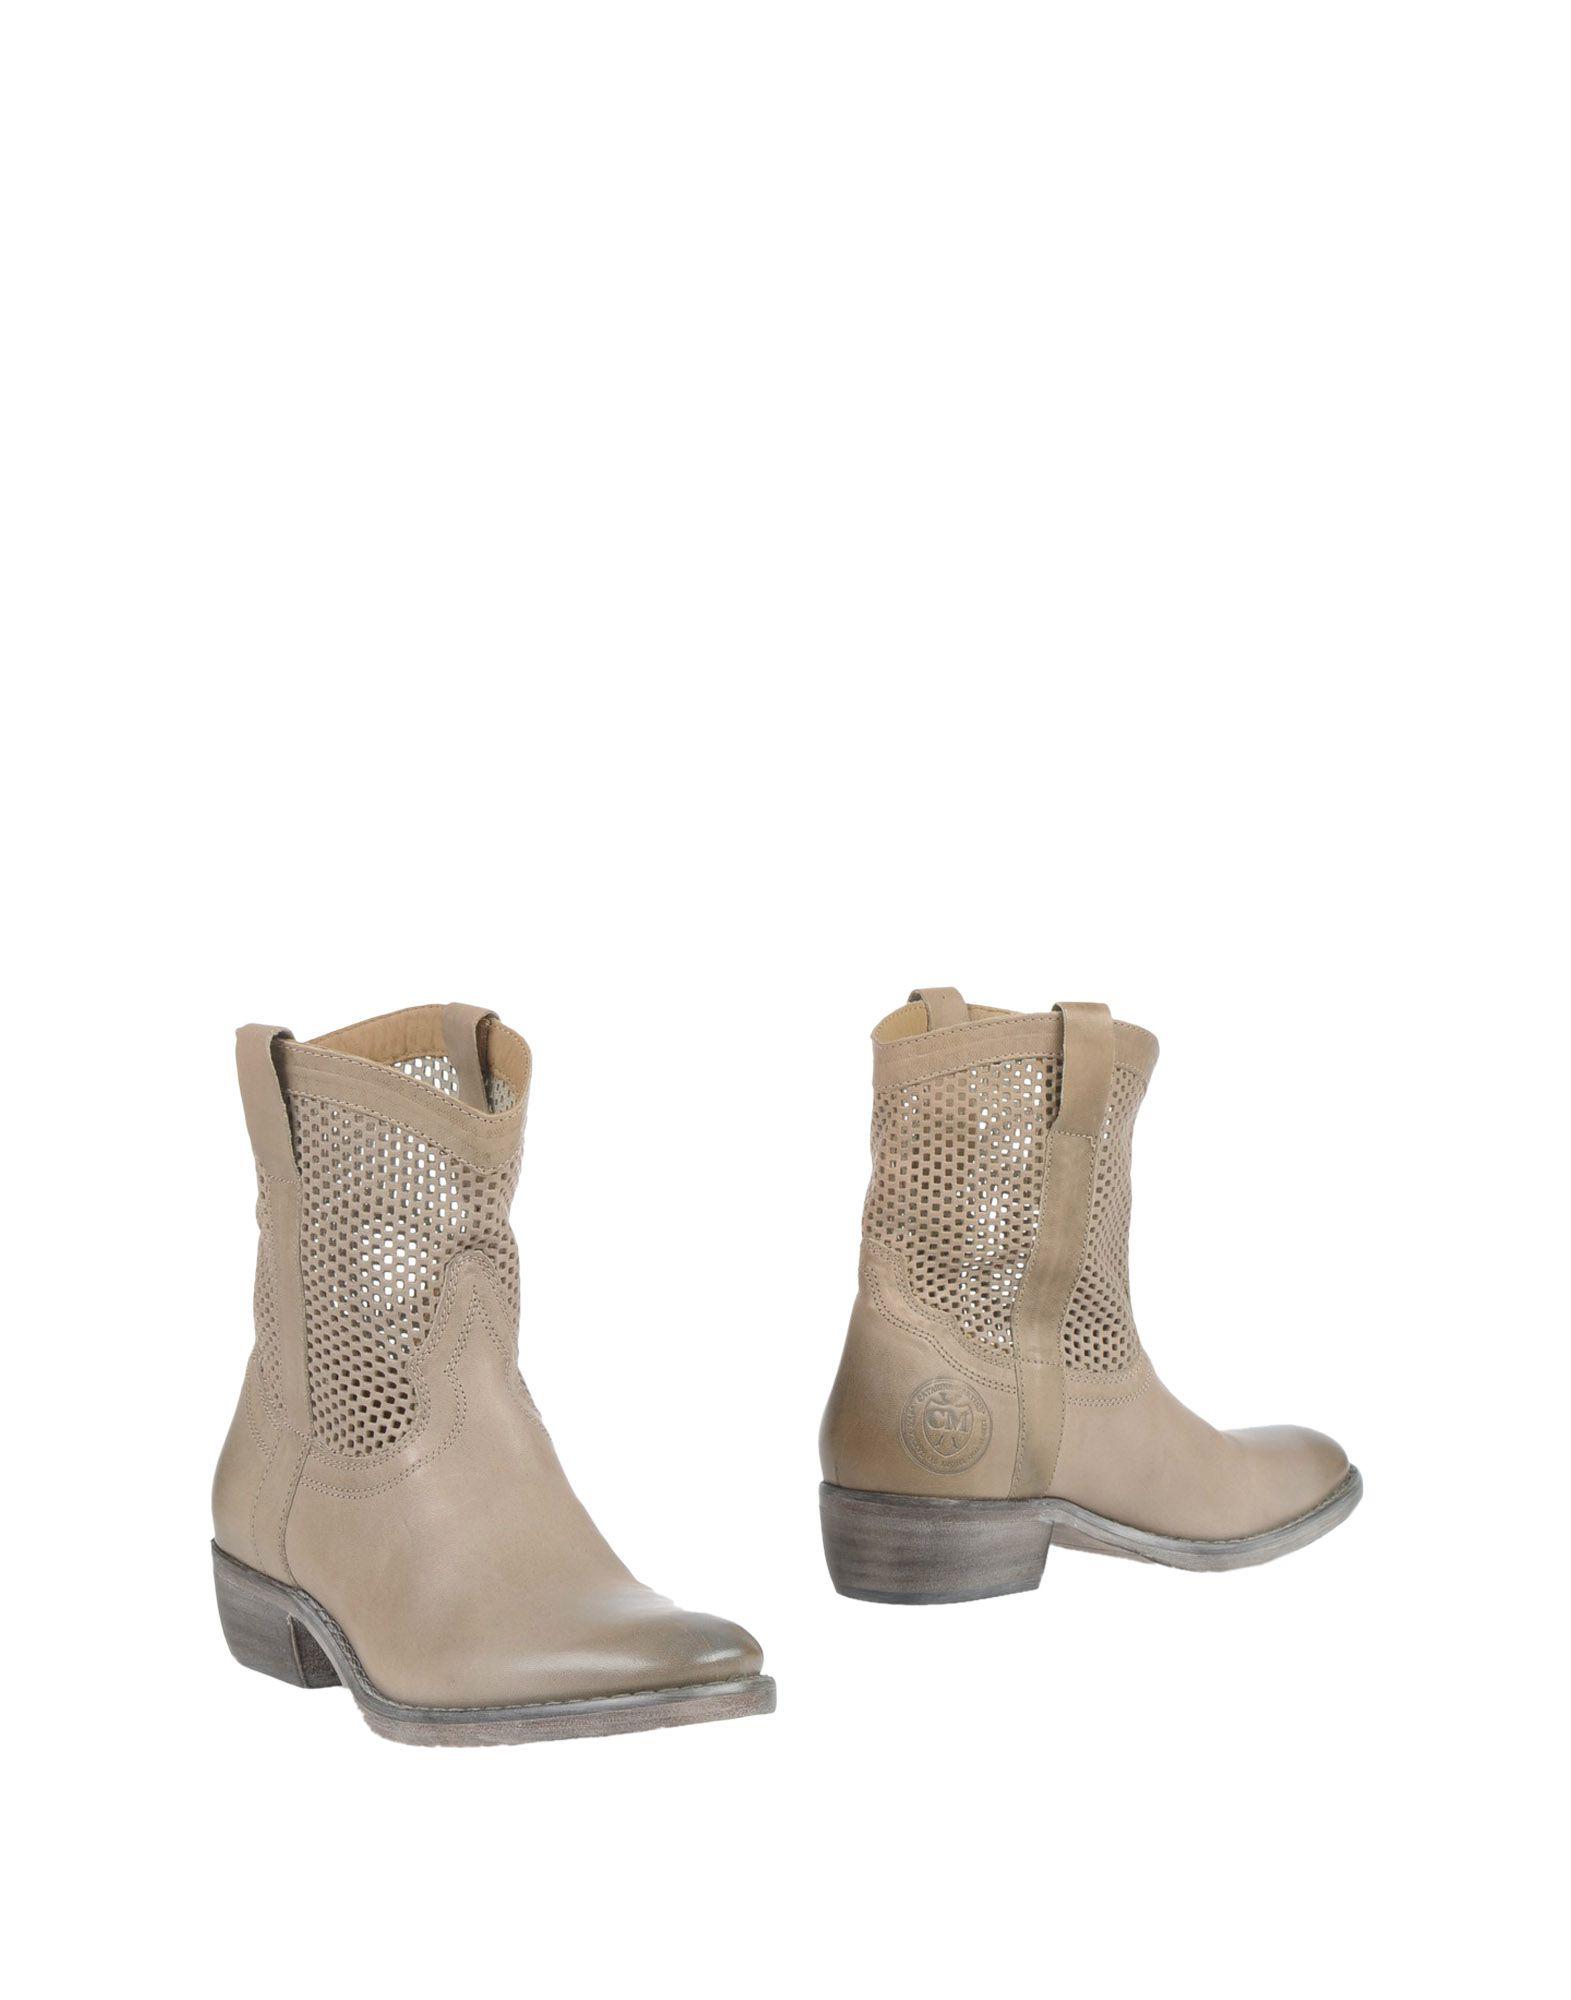 CATARINA MARTINS Полусапоги и высокие ботинки цены онлайн